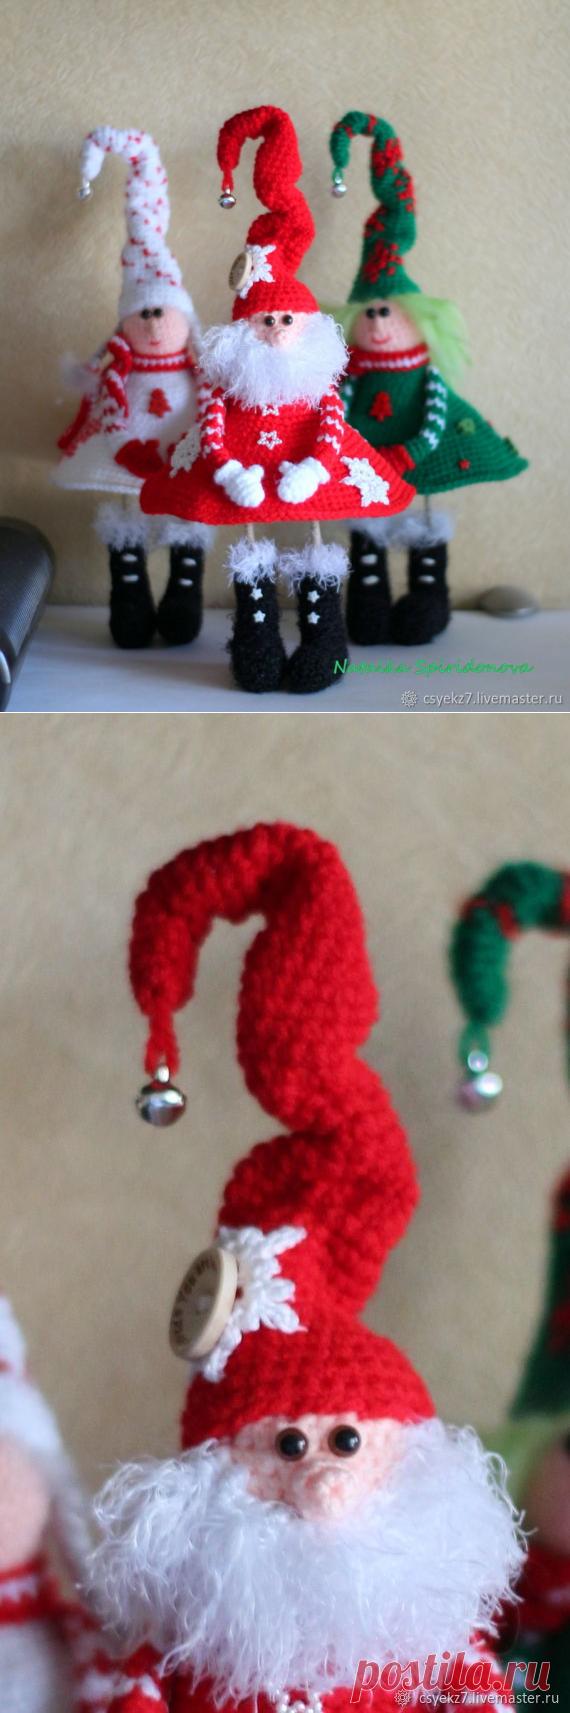 Вяжем Деда Мороза крючком - Ярмарка Мастеров - ручная работа, handmade